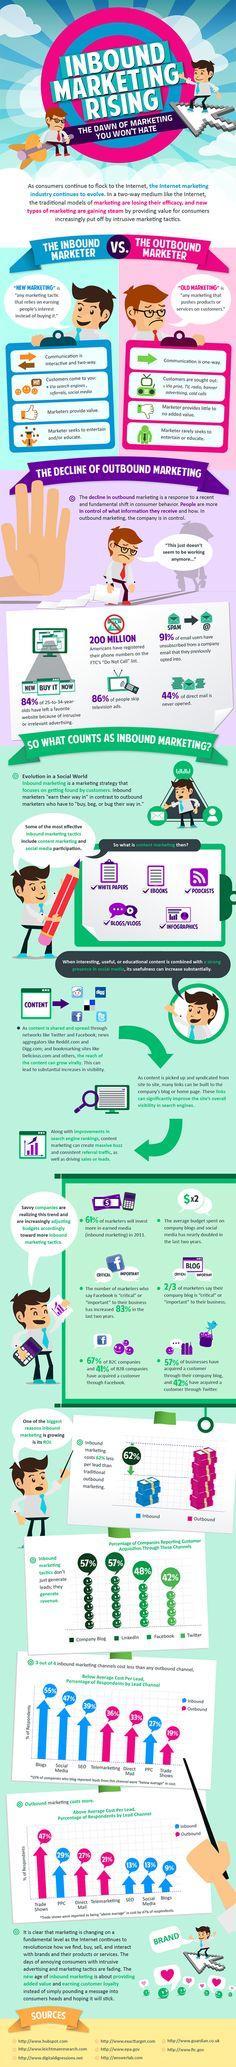 Inbound Marketing Rising | Visual.ly